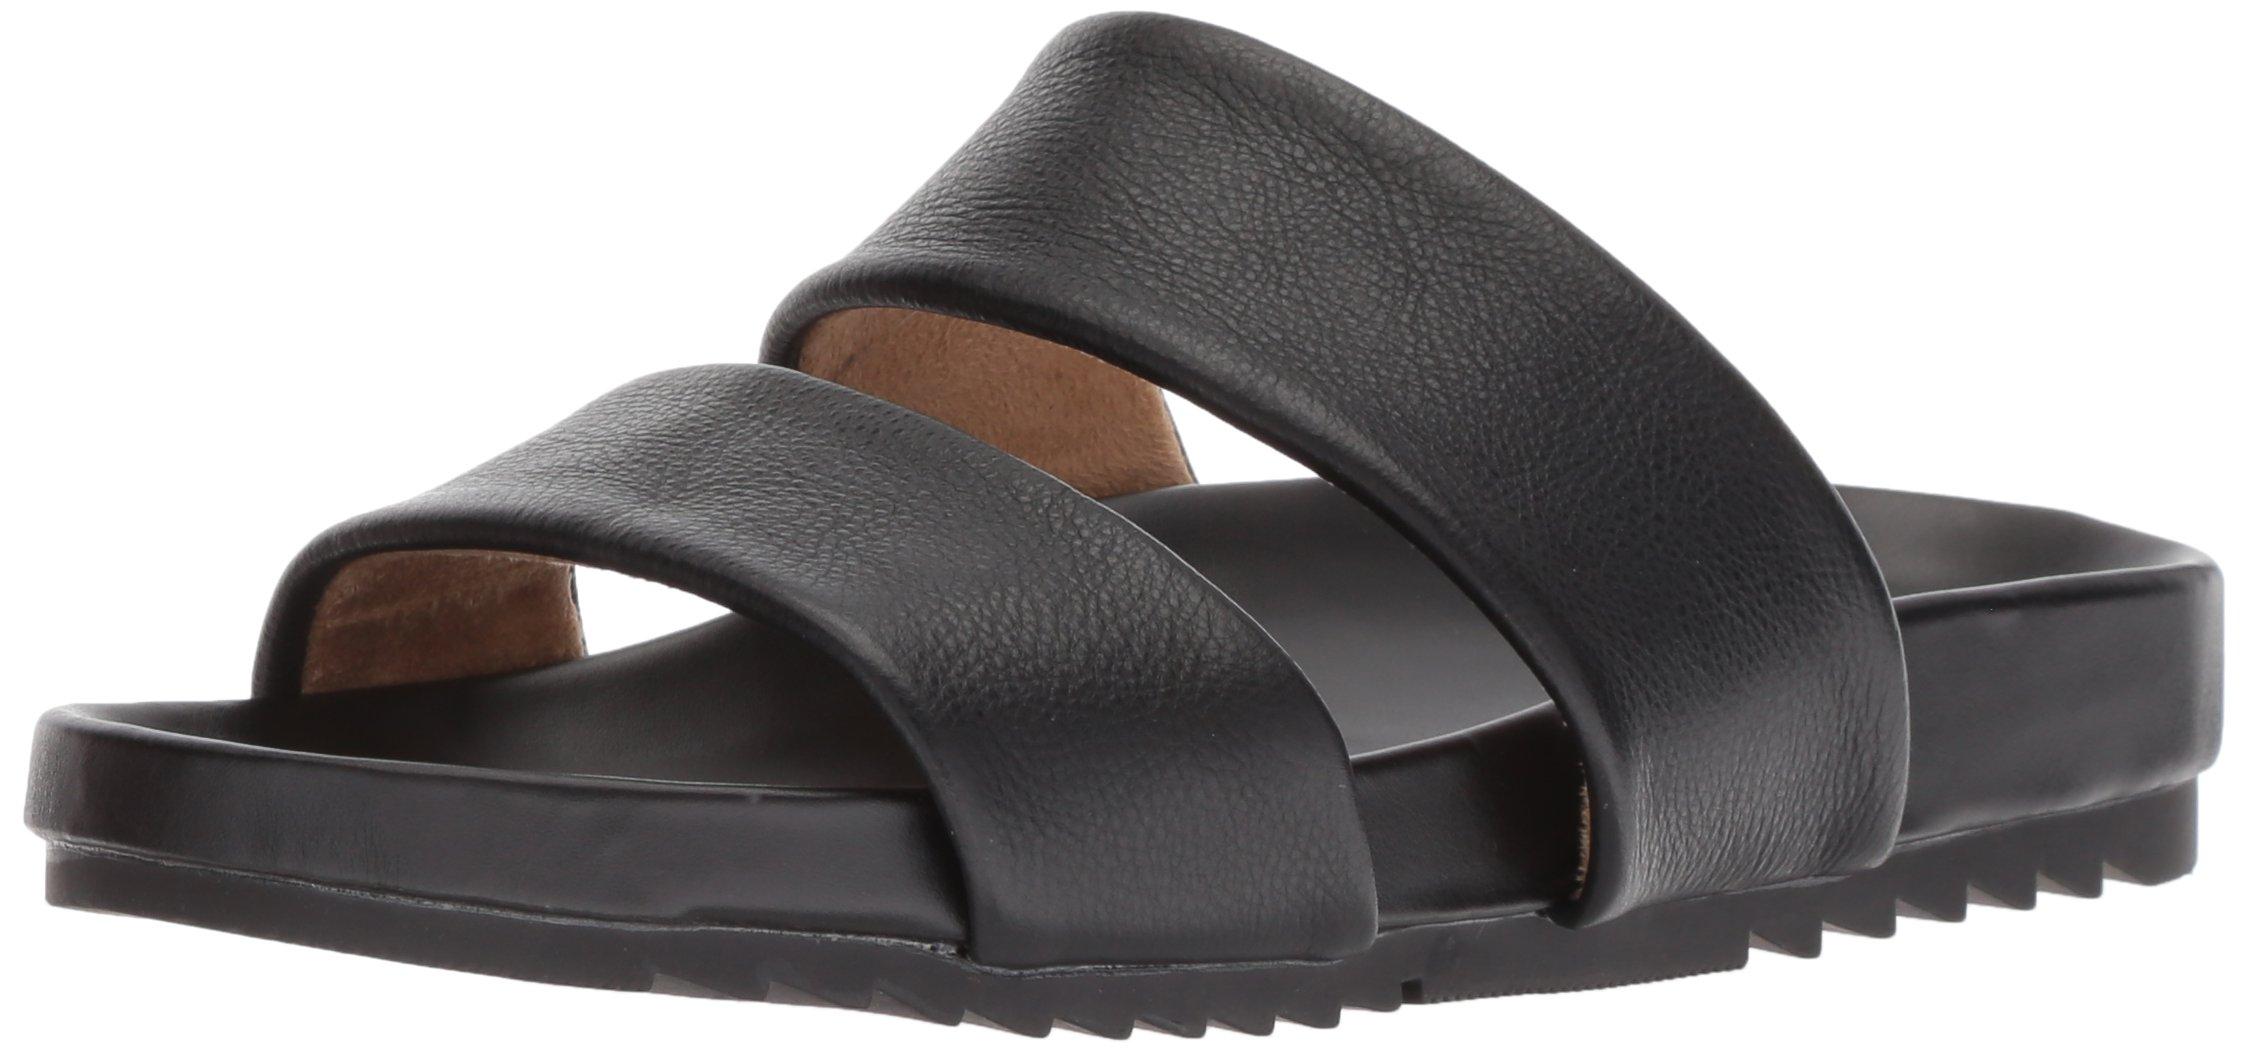 Naturalizer Women's Amabella Slide Sandal, Black, 9 W US